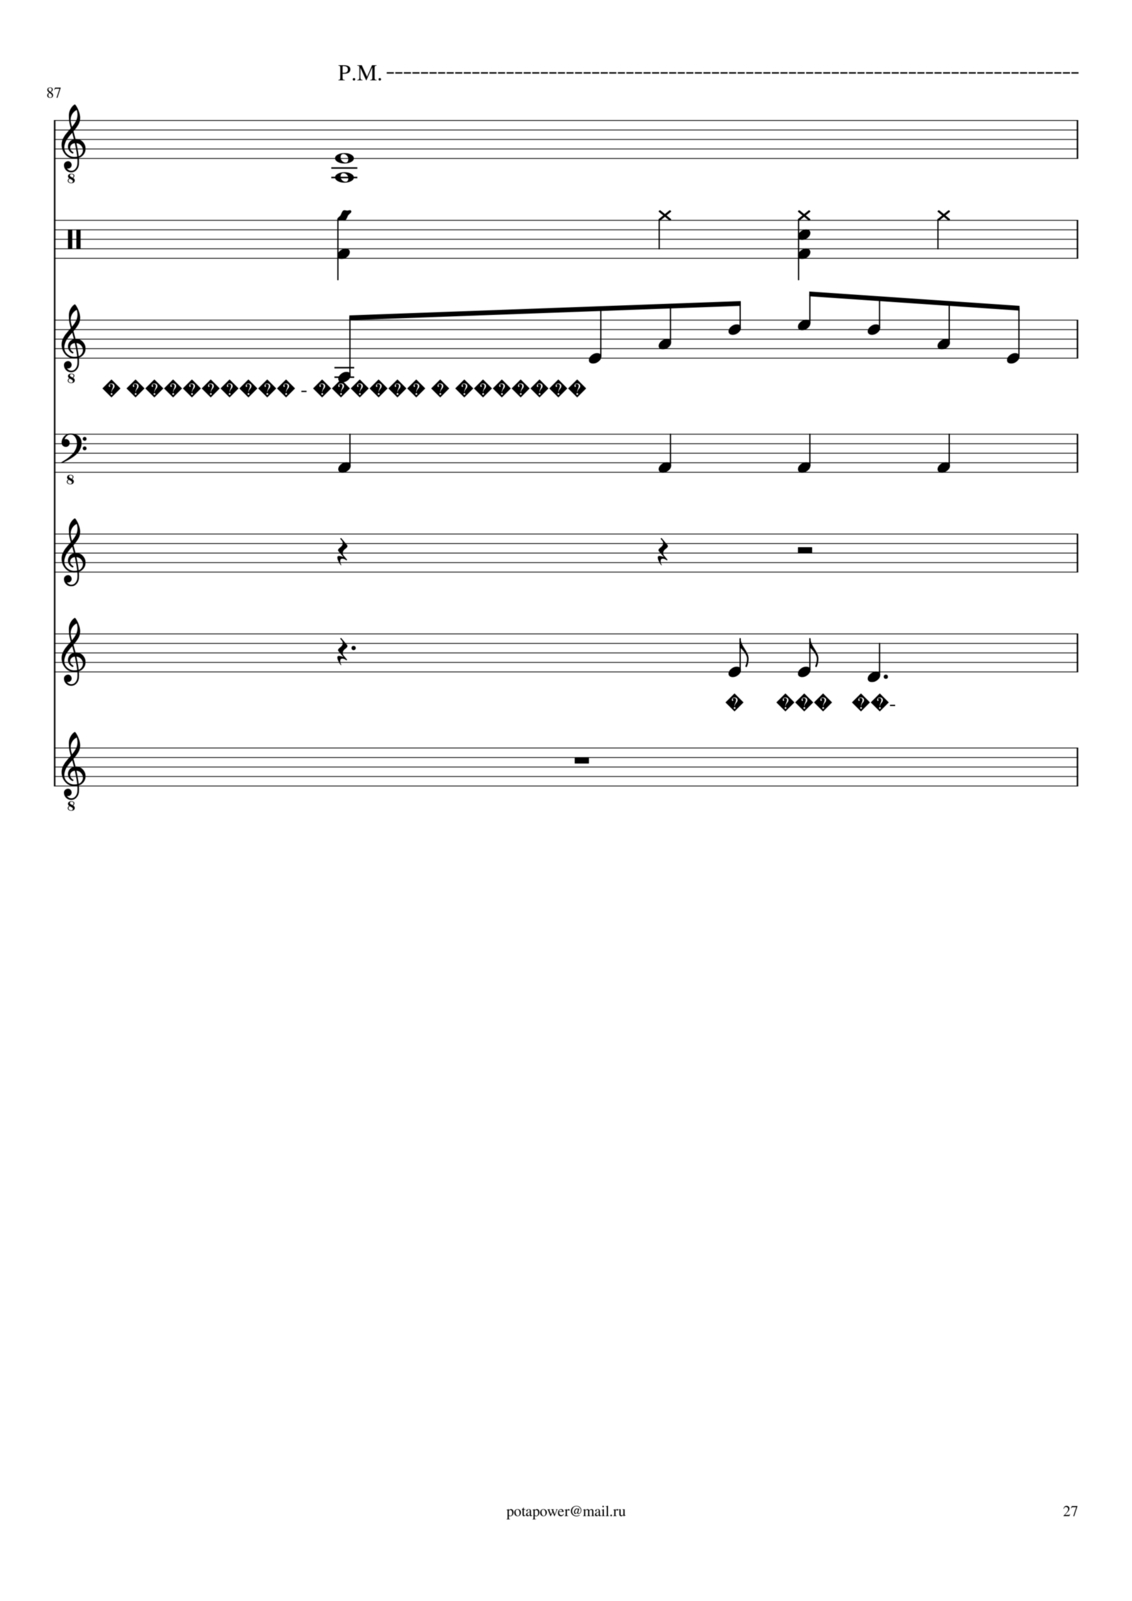 Ten lyubvi slide, Image 27